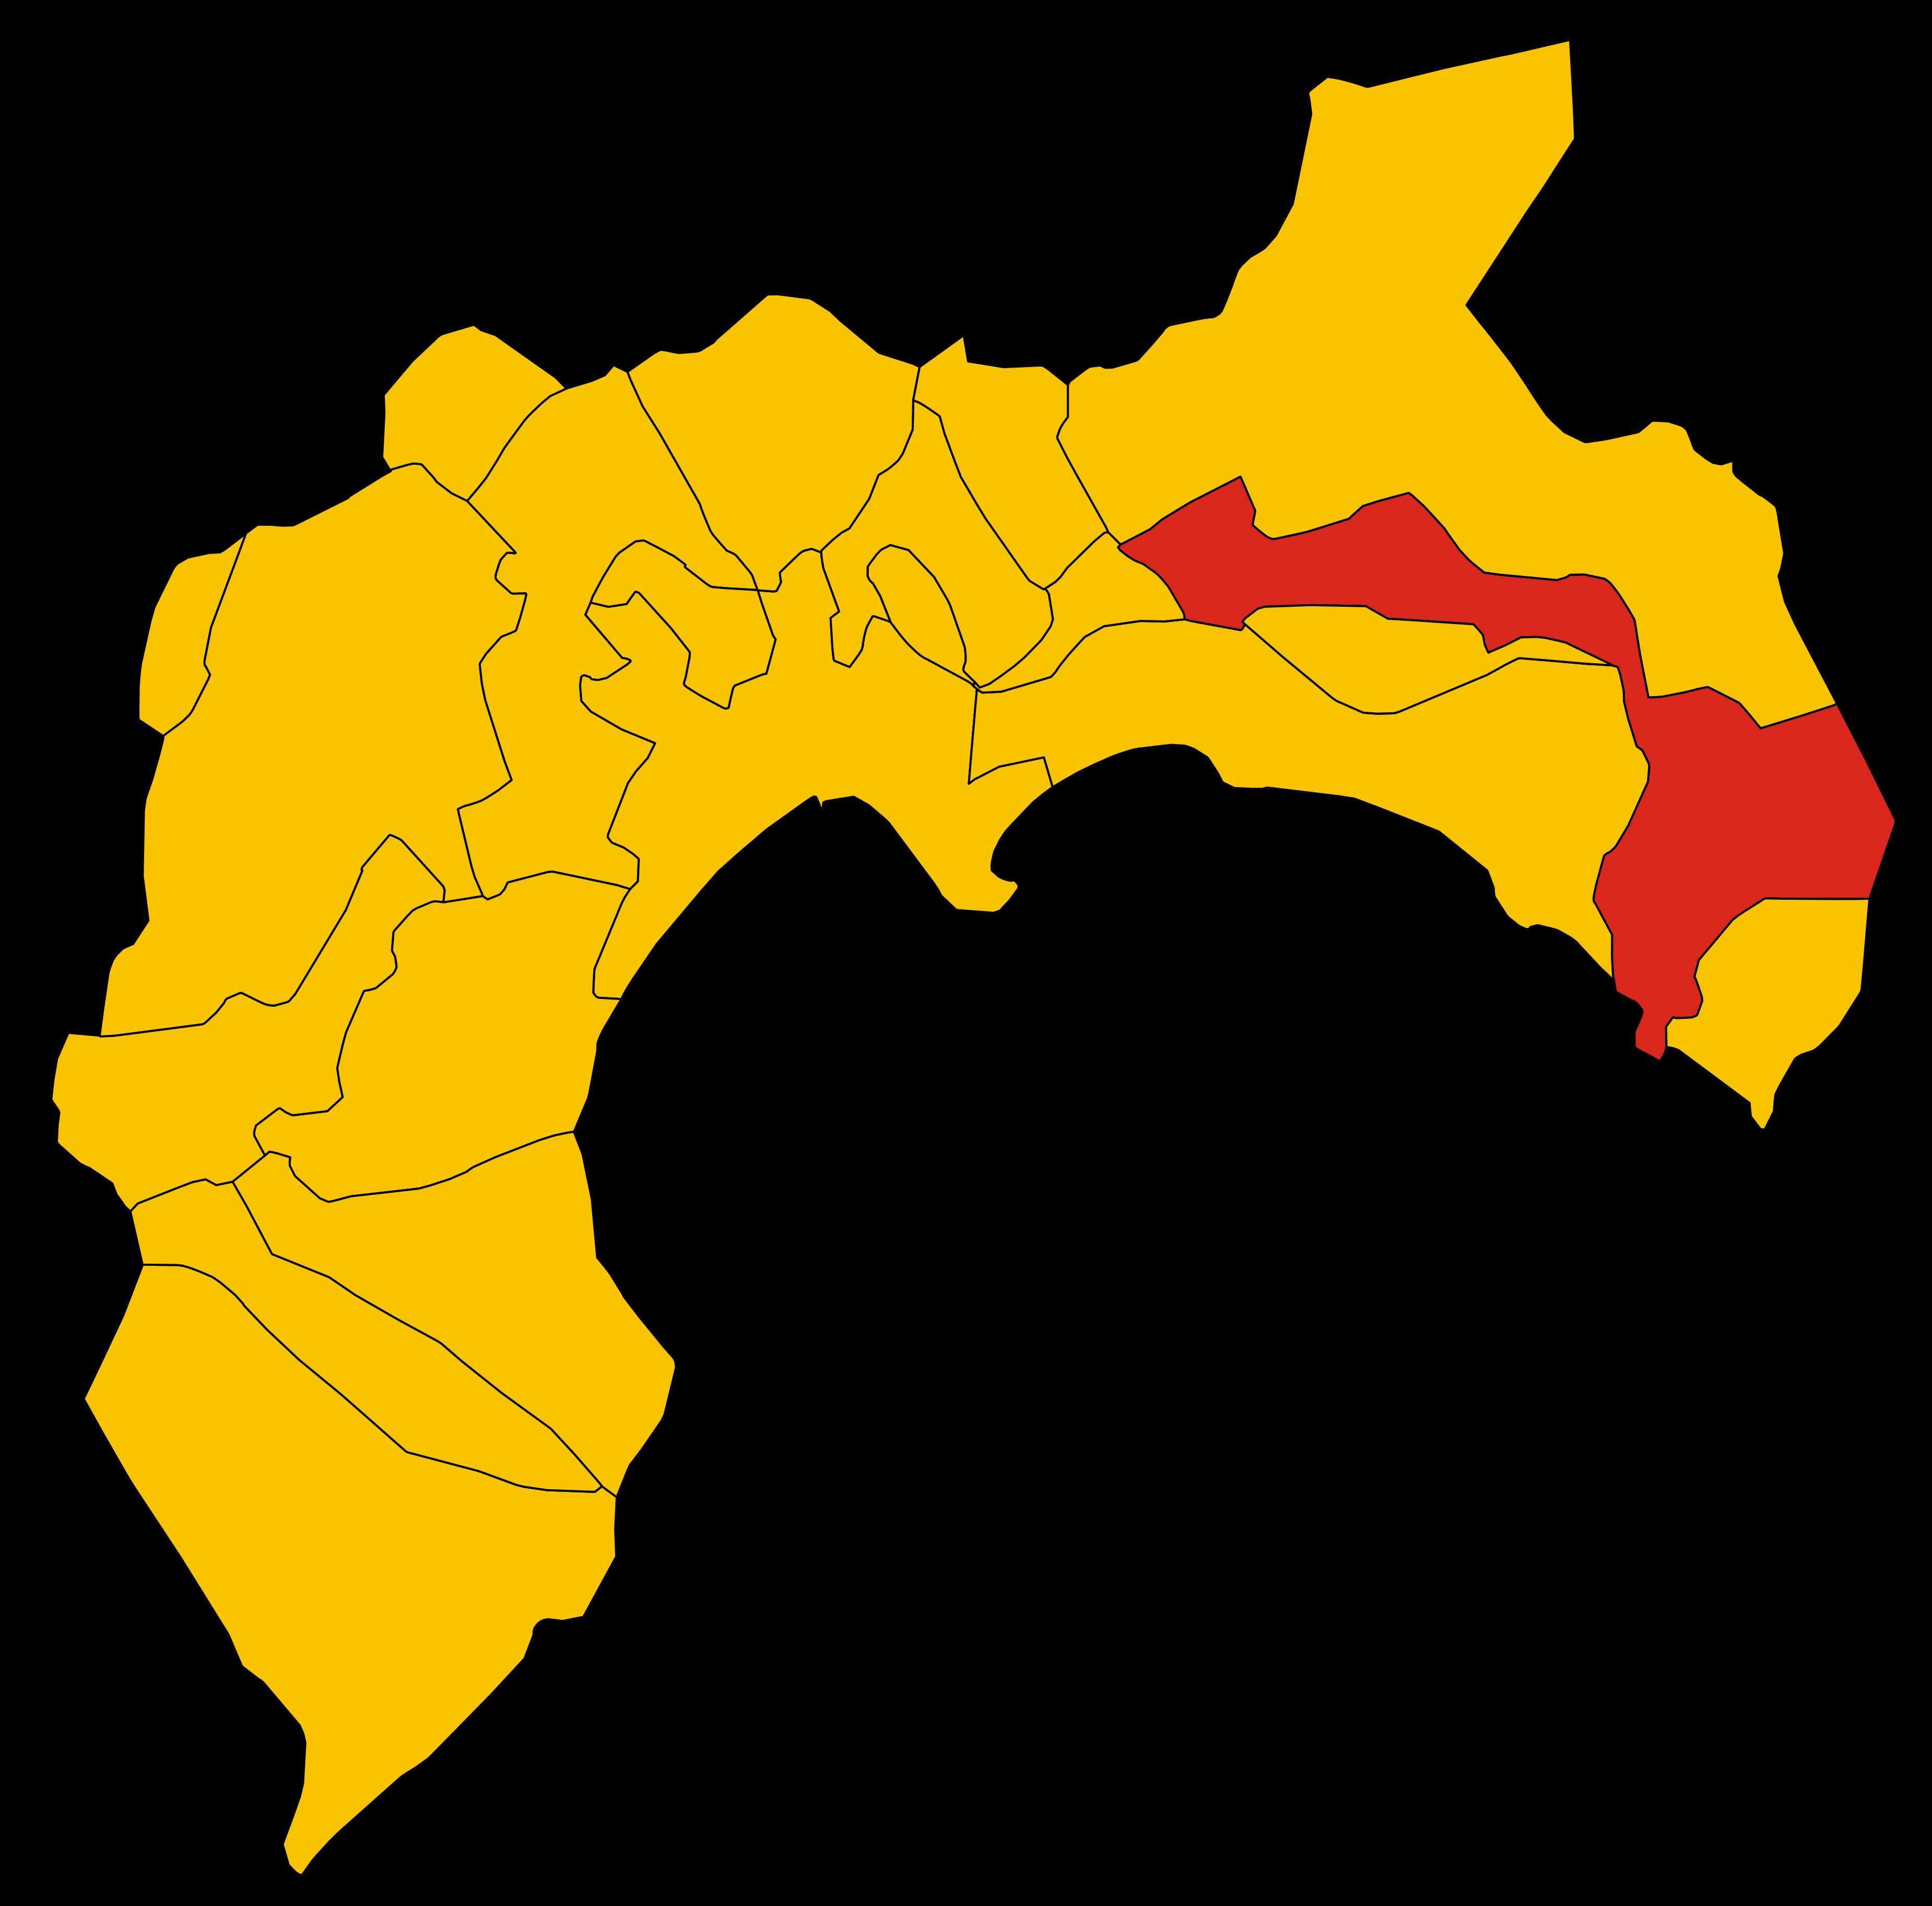 Maracas clipart svg. File map of comune